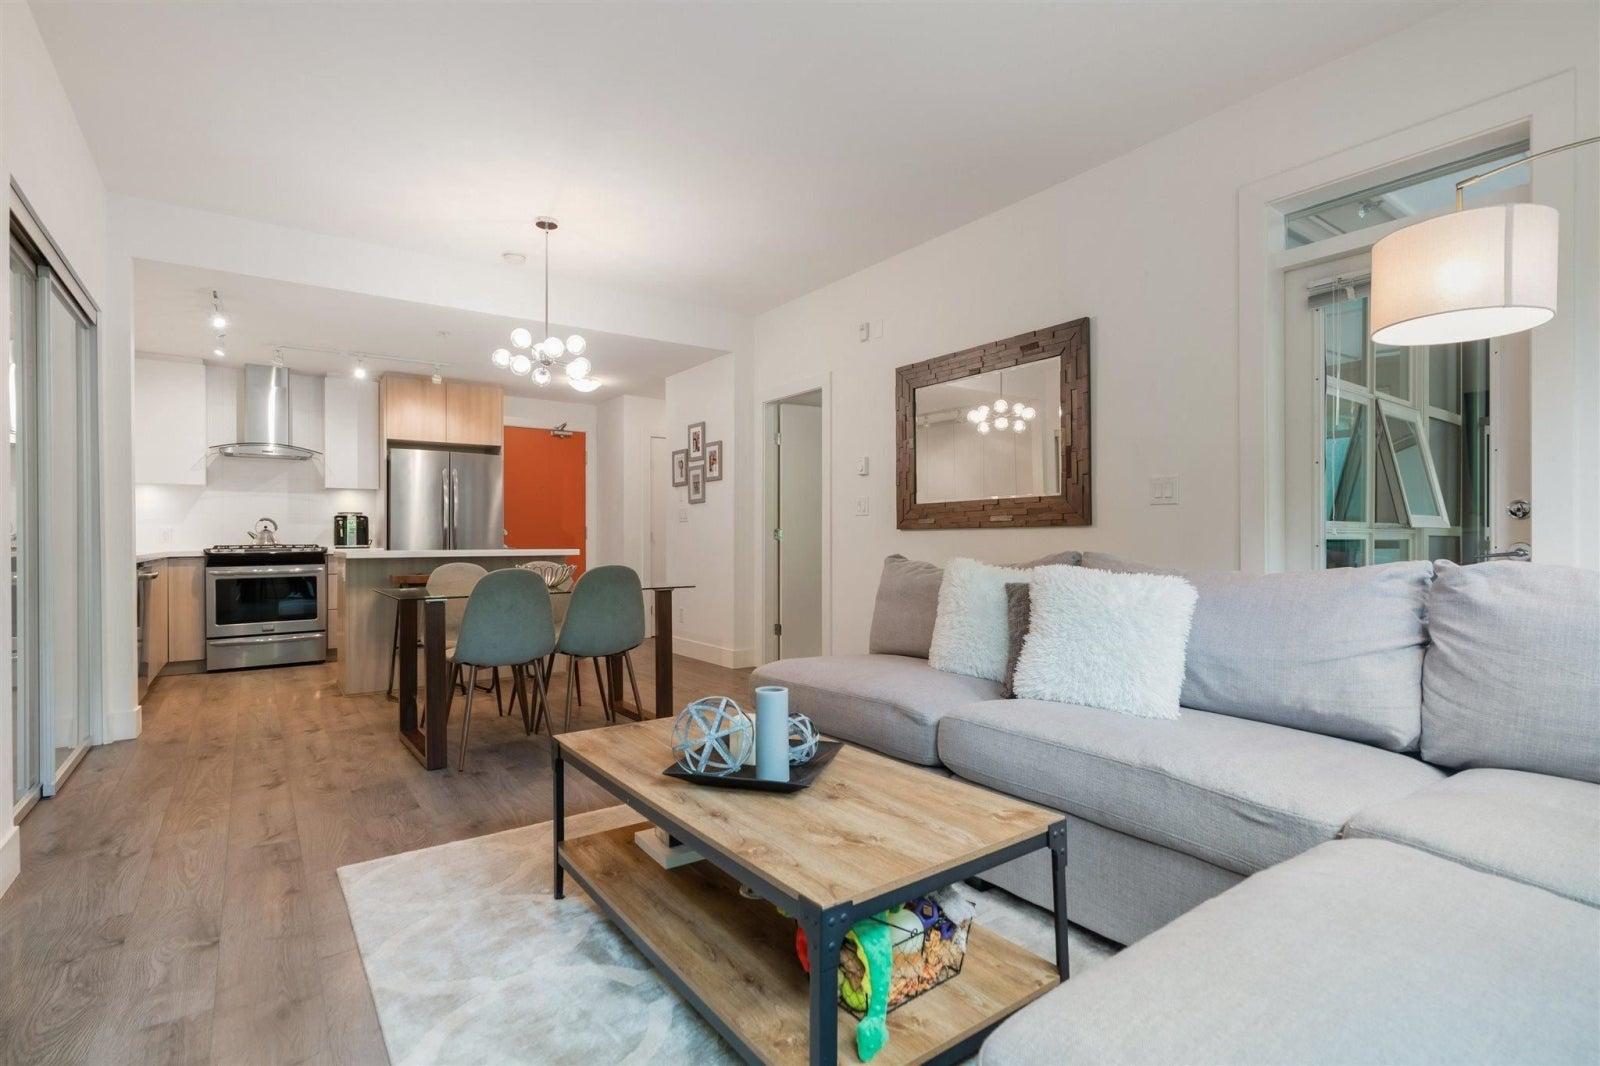 222 3602 ALDERCREST DRIVE - Roche Point Apartment/Condo for sale, 2 Bedrooms (R2603975) #6